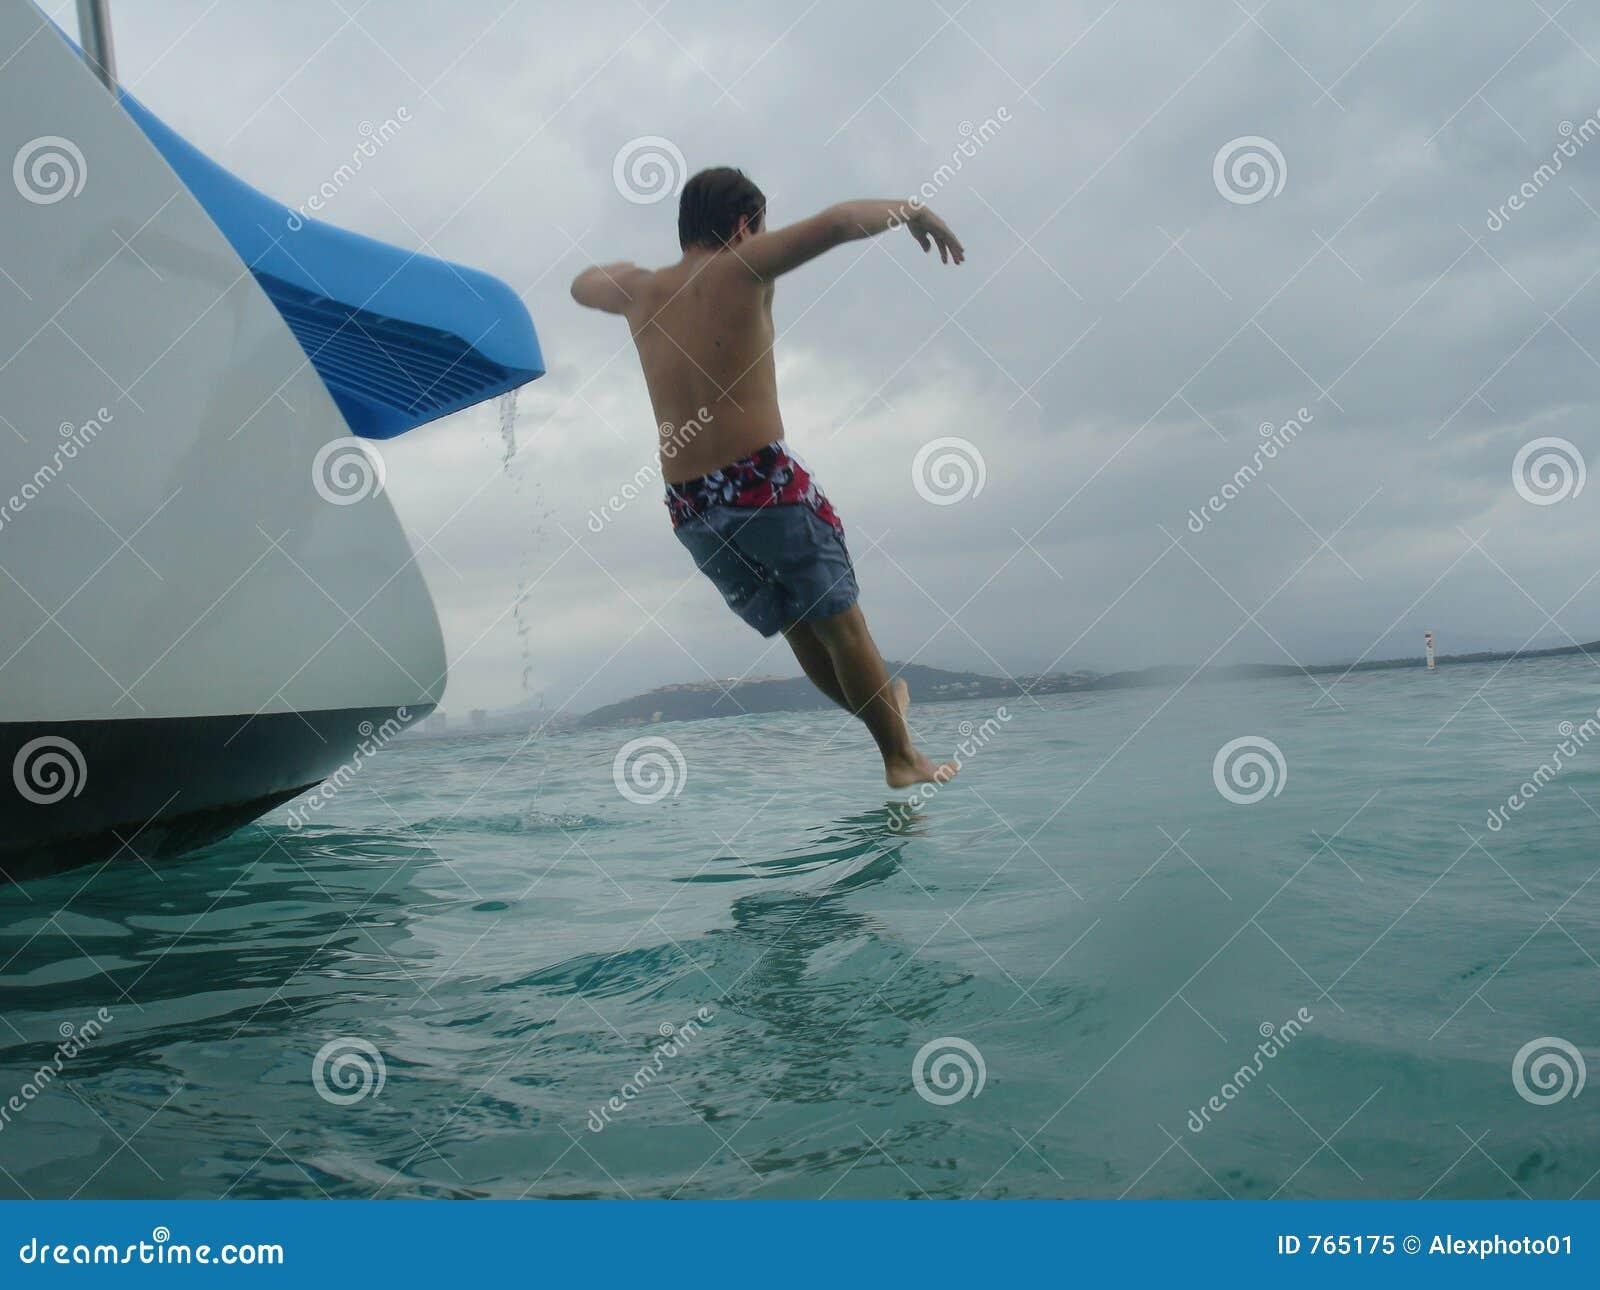 Traveler slides of catamaran Caribbean, Puerto Rico